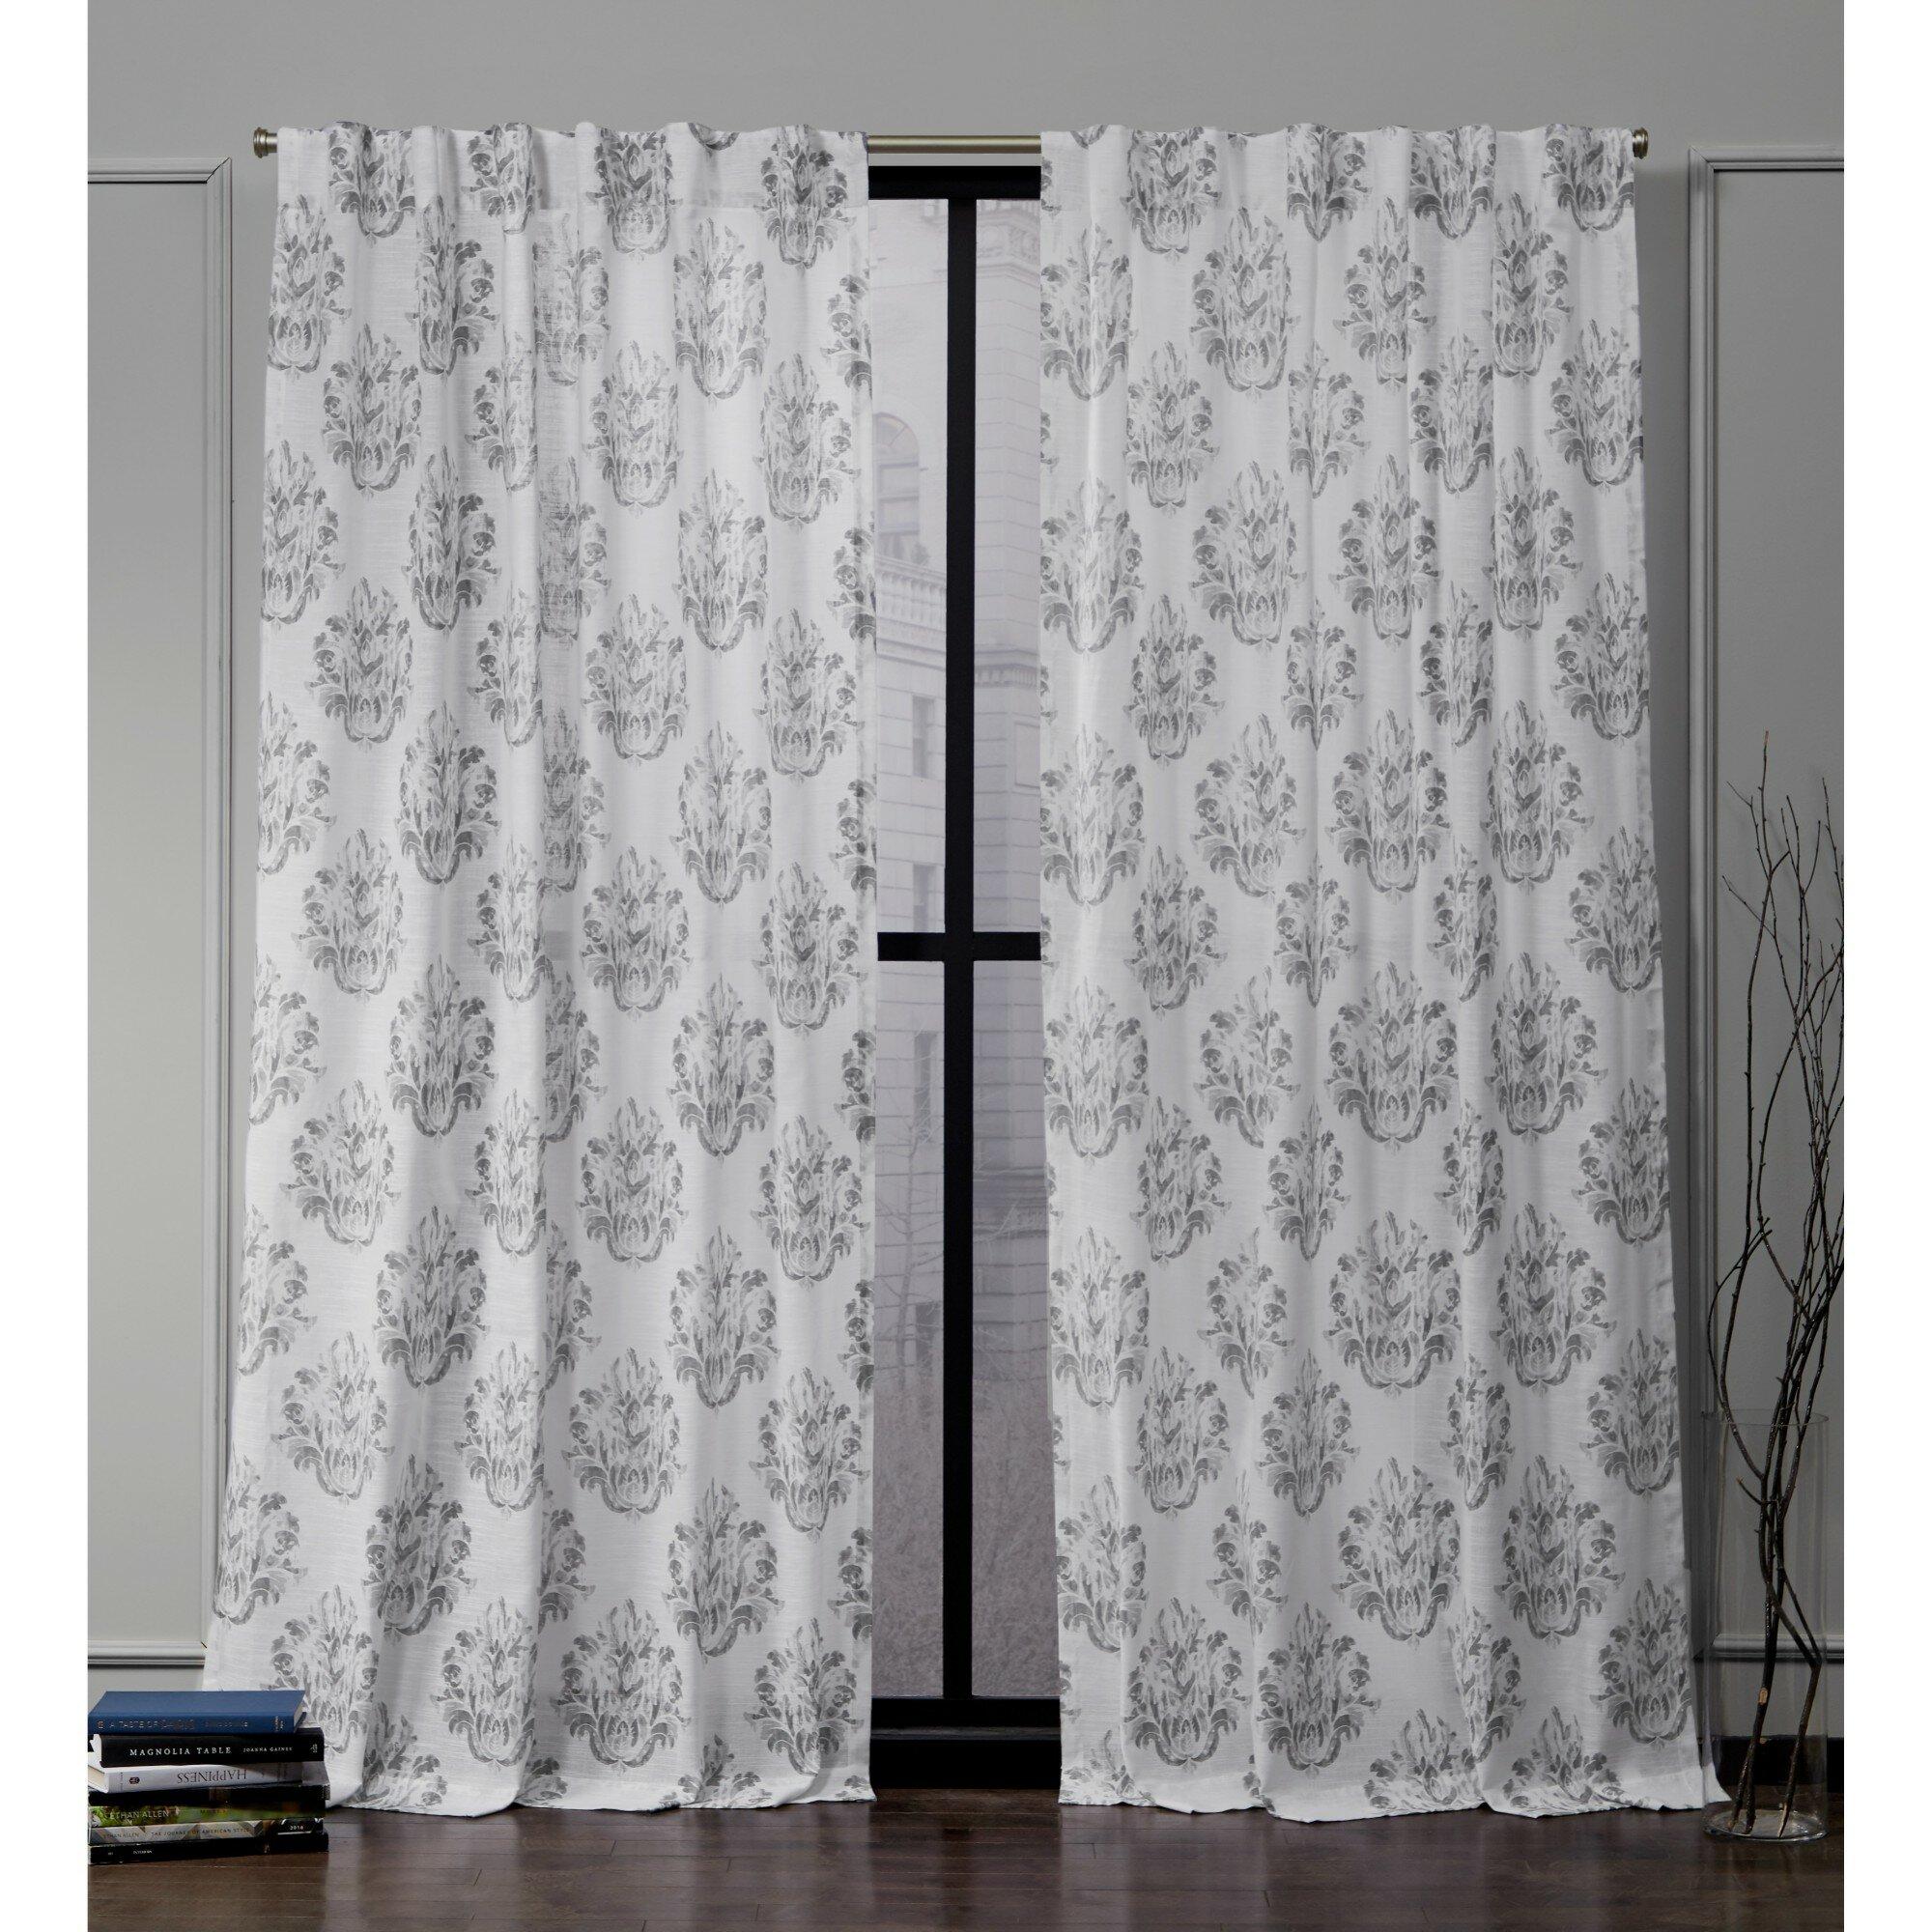 Photo Curtains Leaves sliding curtain sliding curtain to measure photo print//motif